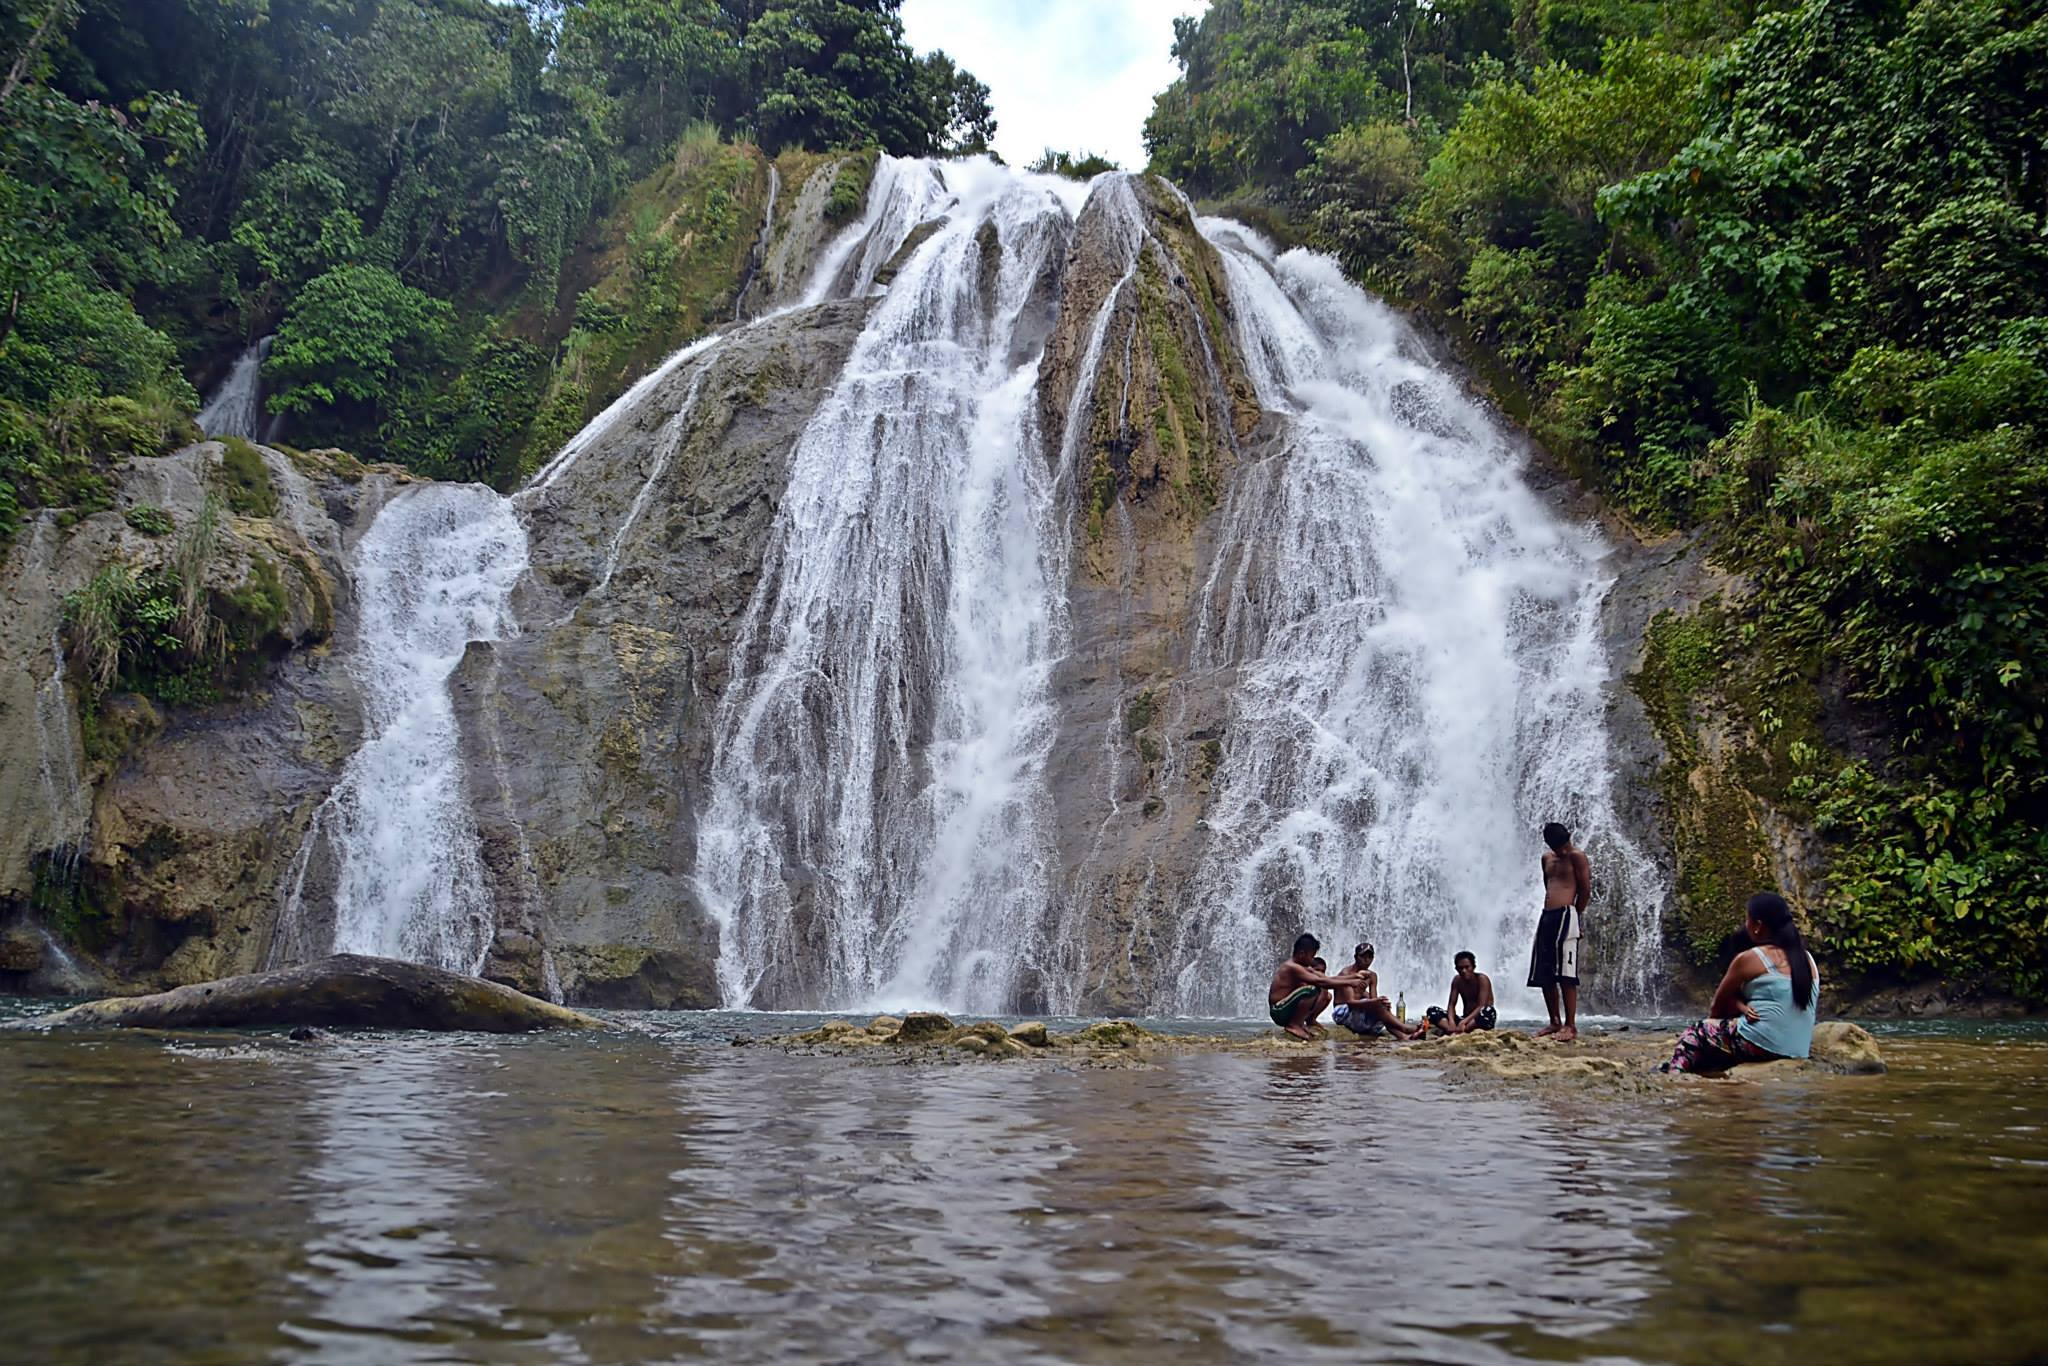 bega falls, mabuhay, prosperidad, agusan del sur